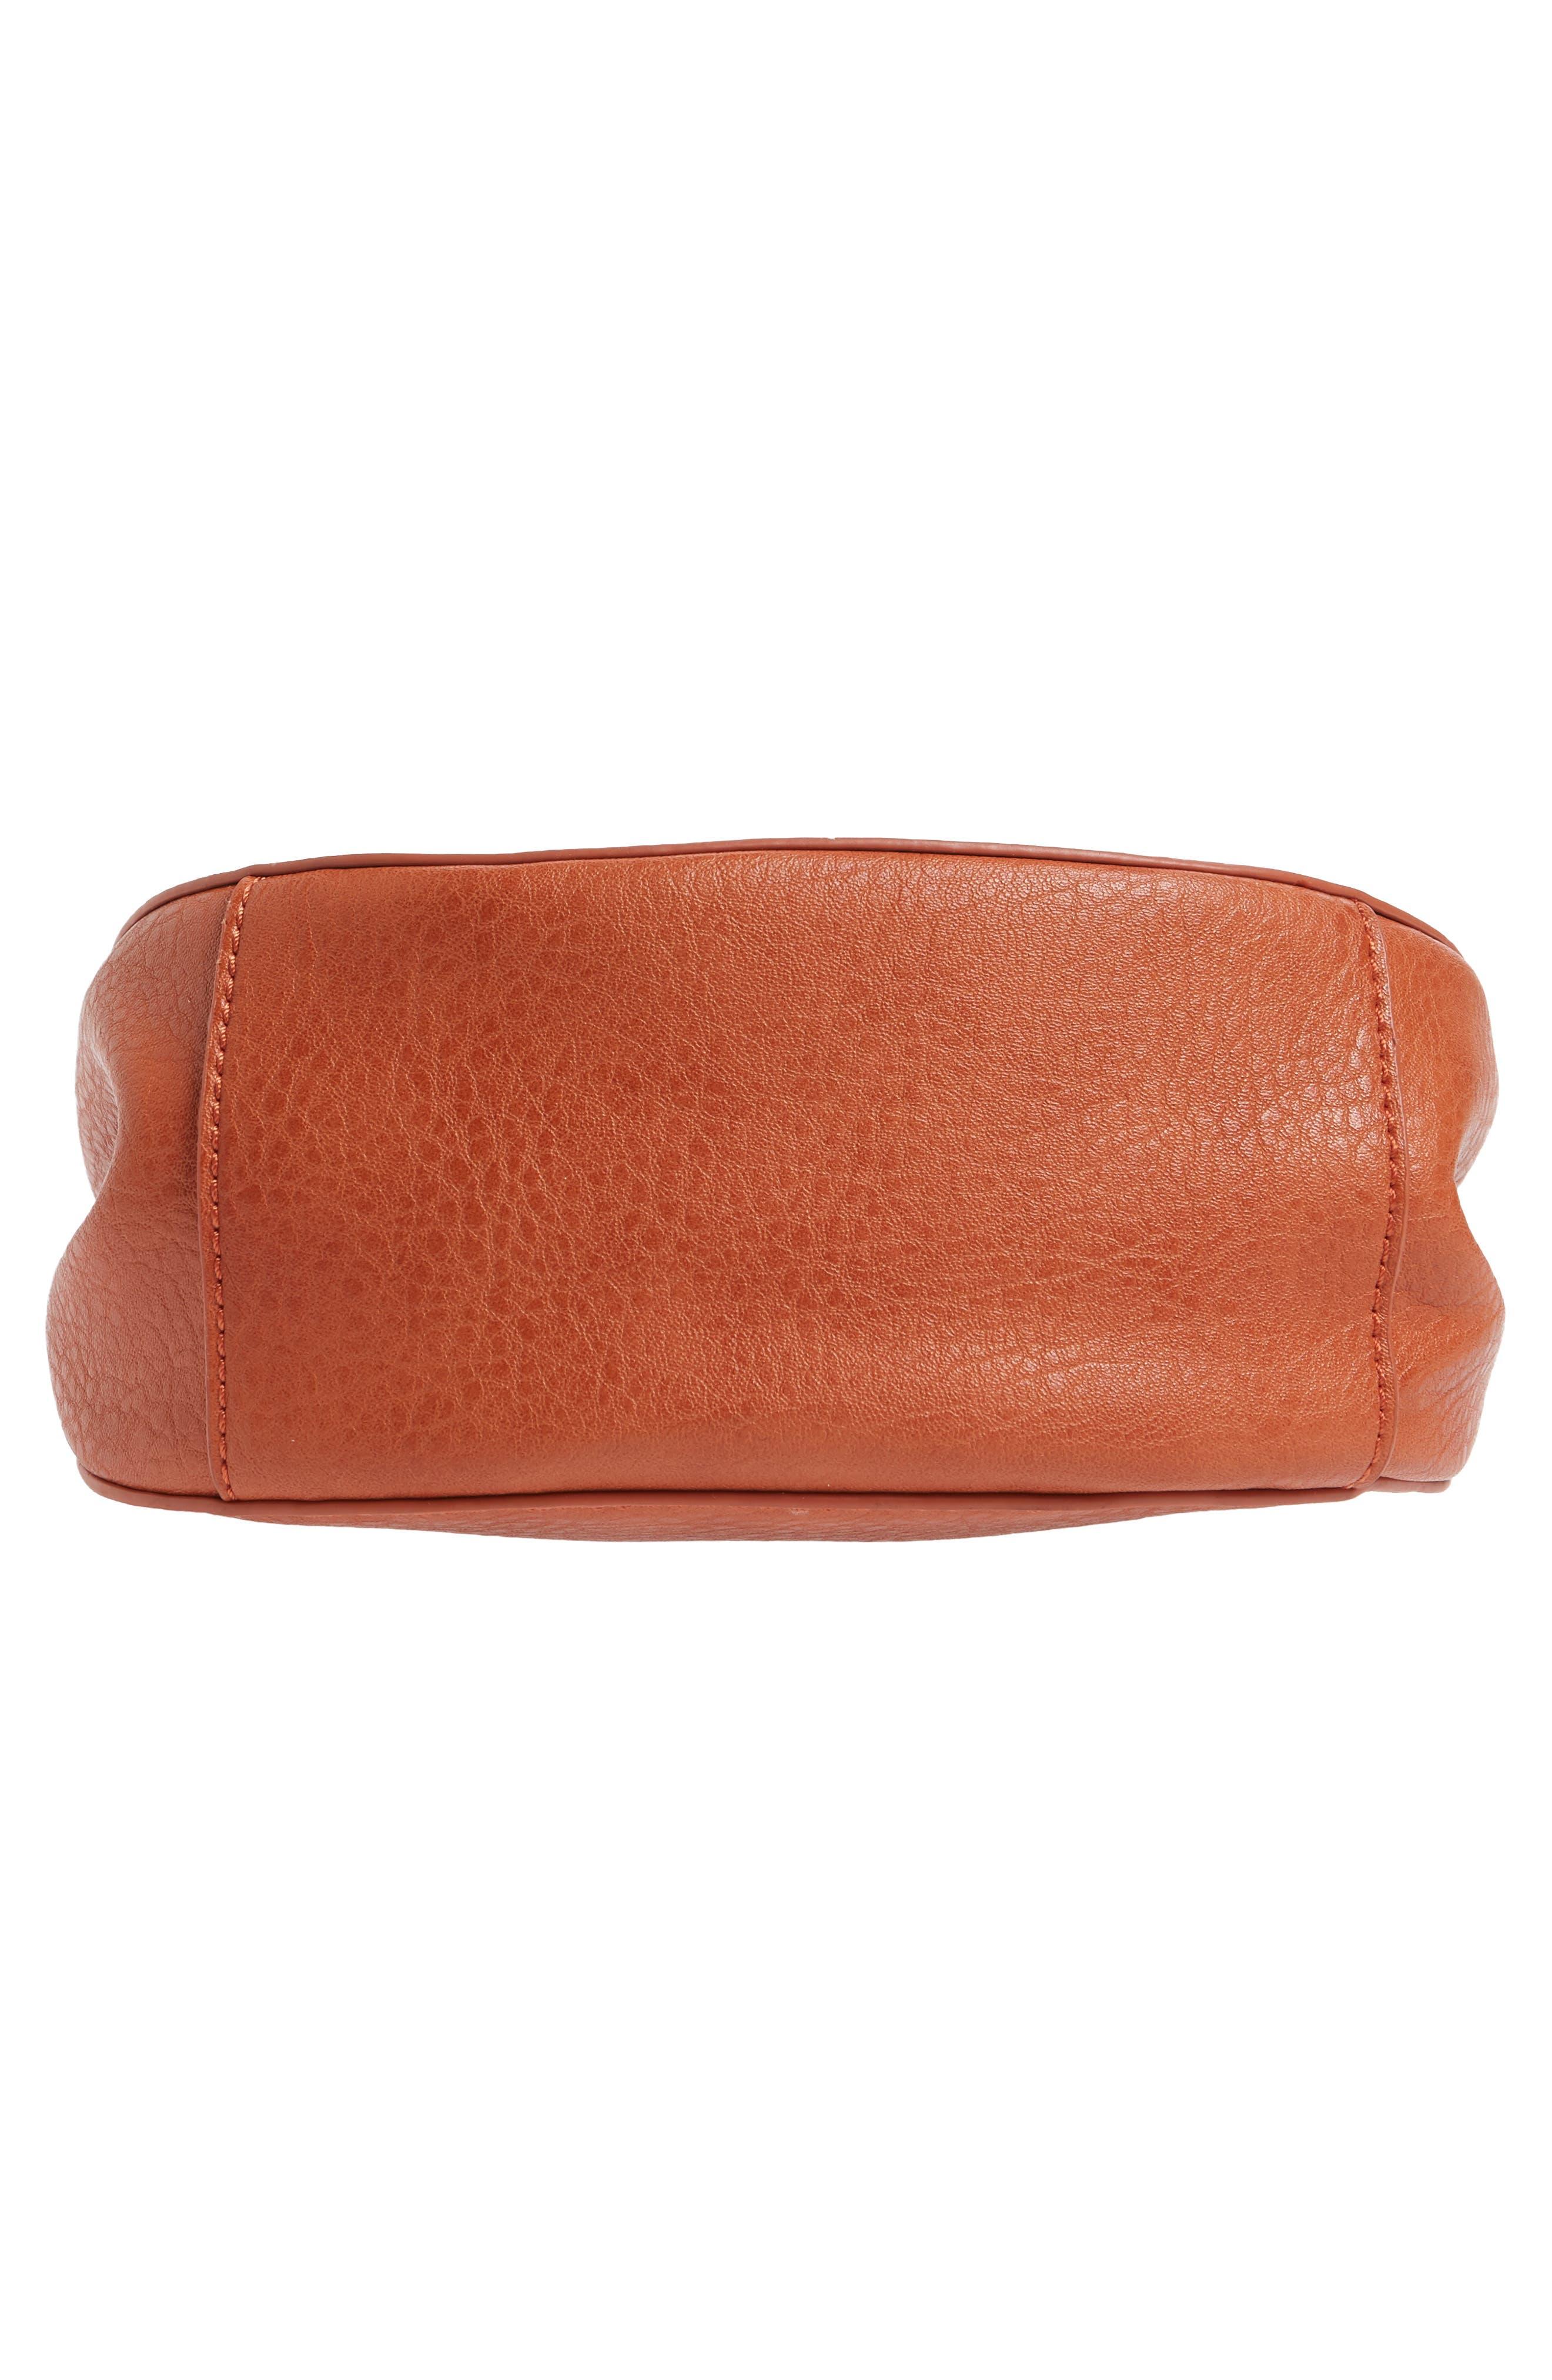 Tassel Faux Leather Crossbody Saddle Bag,                             Alternate thumbnail 12, color,